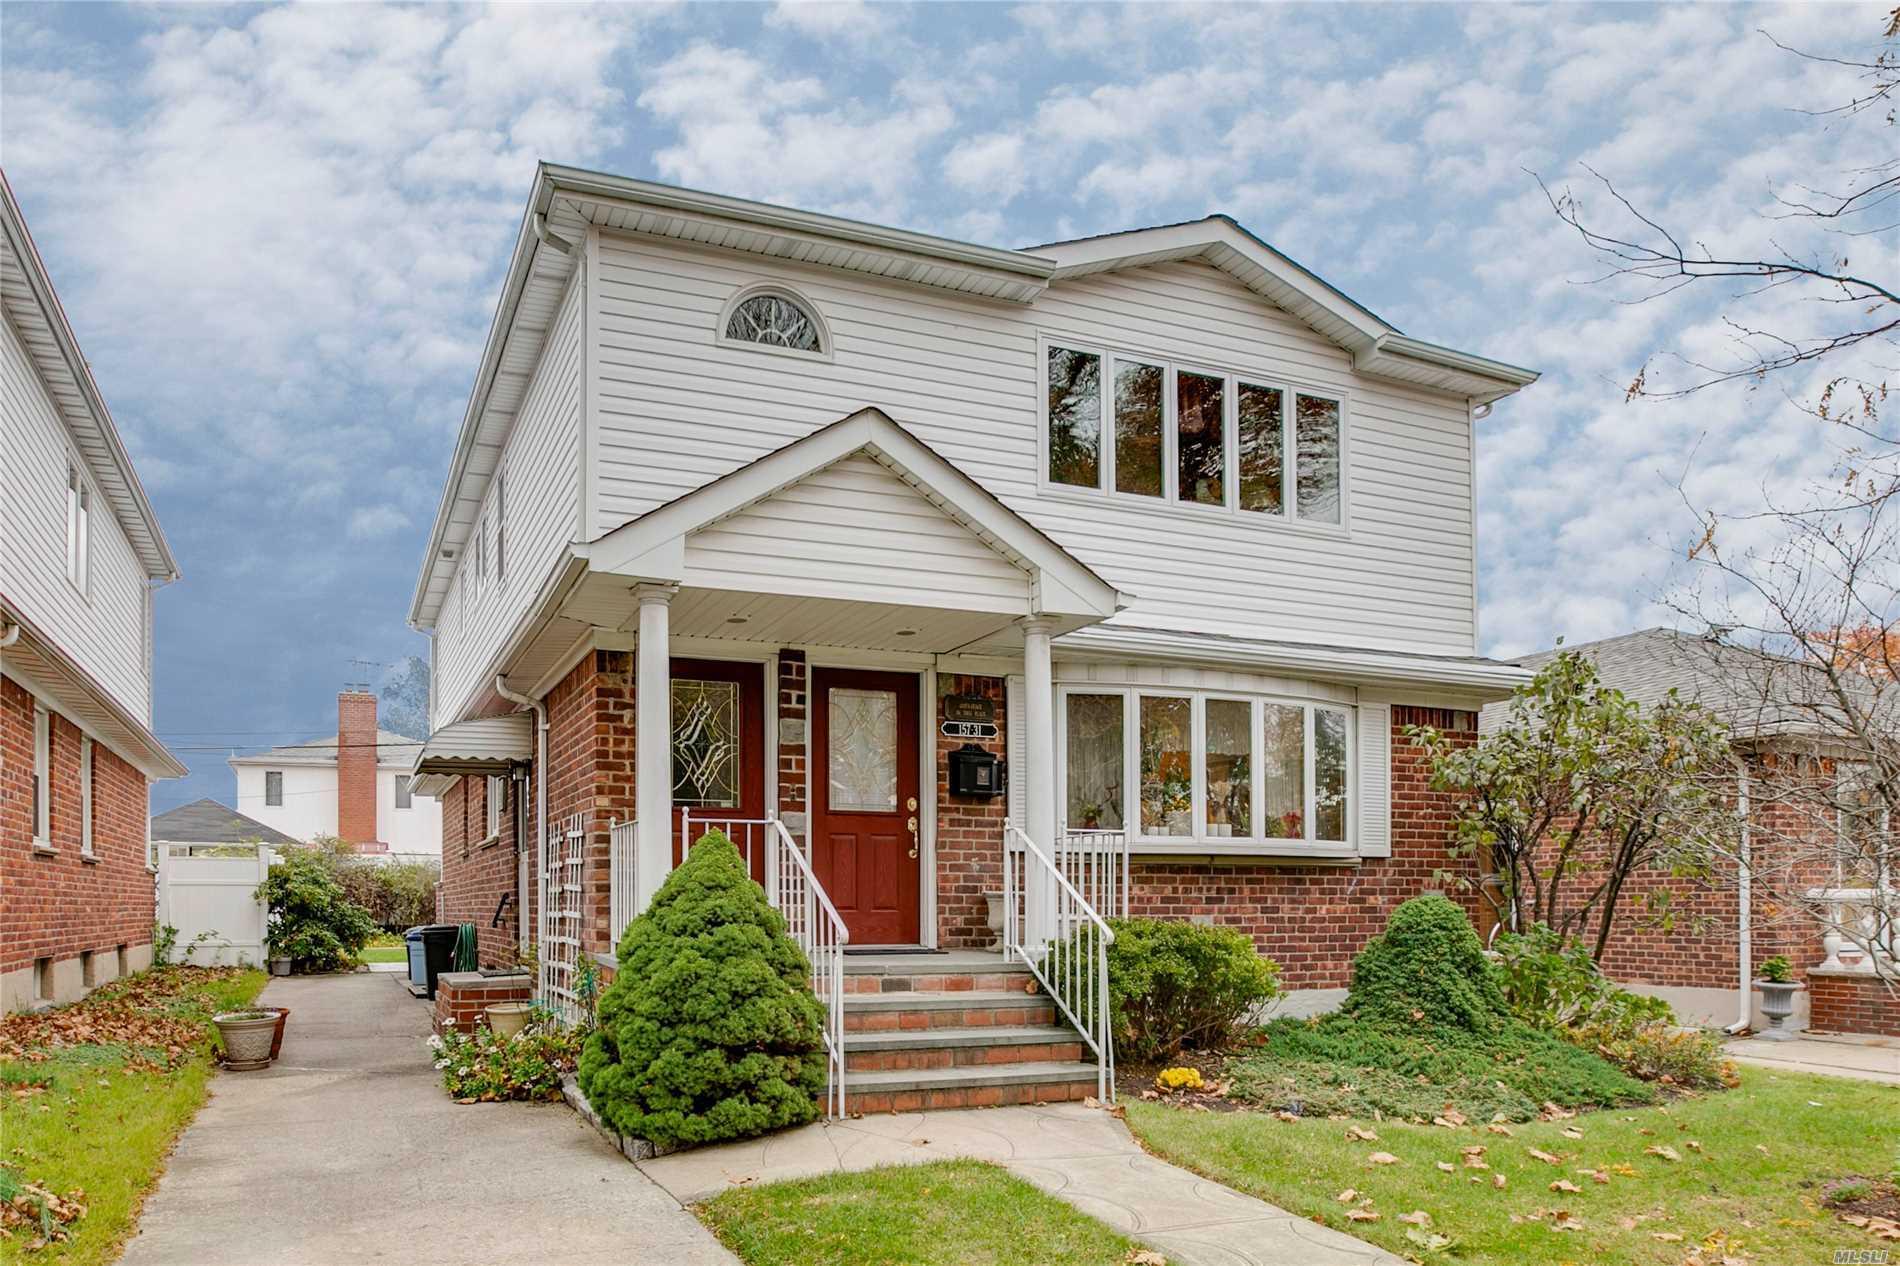 Property for sale at 157-31 16th Road, Whitestone NY 11357, Whitestone,  New York 11357